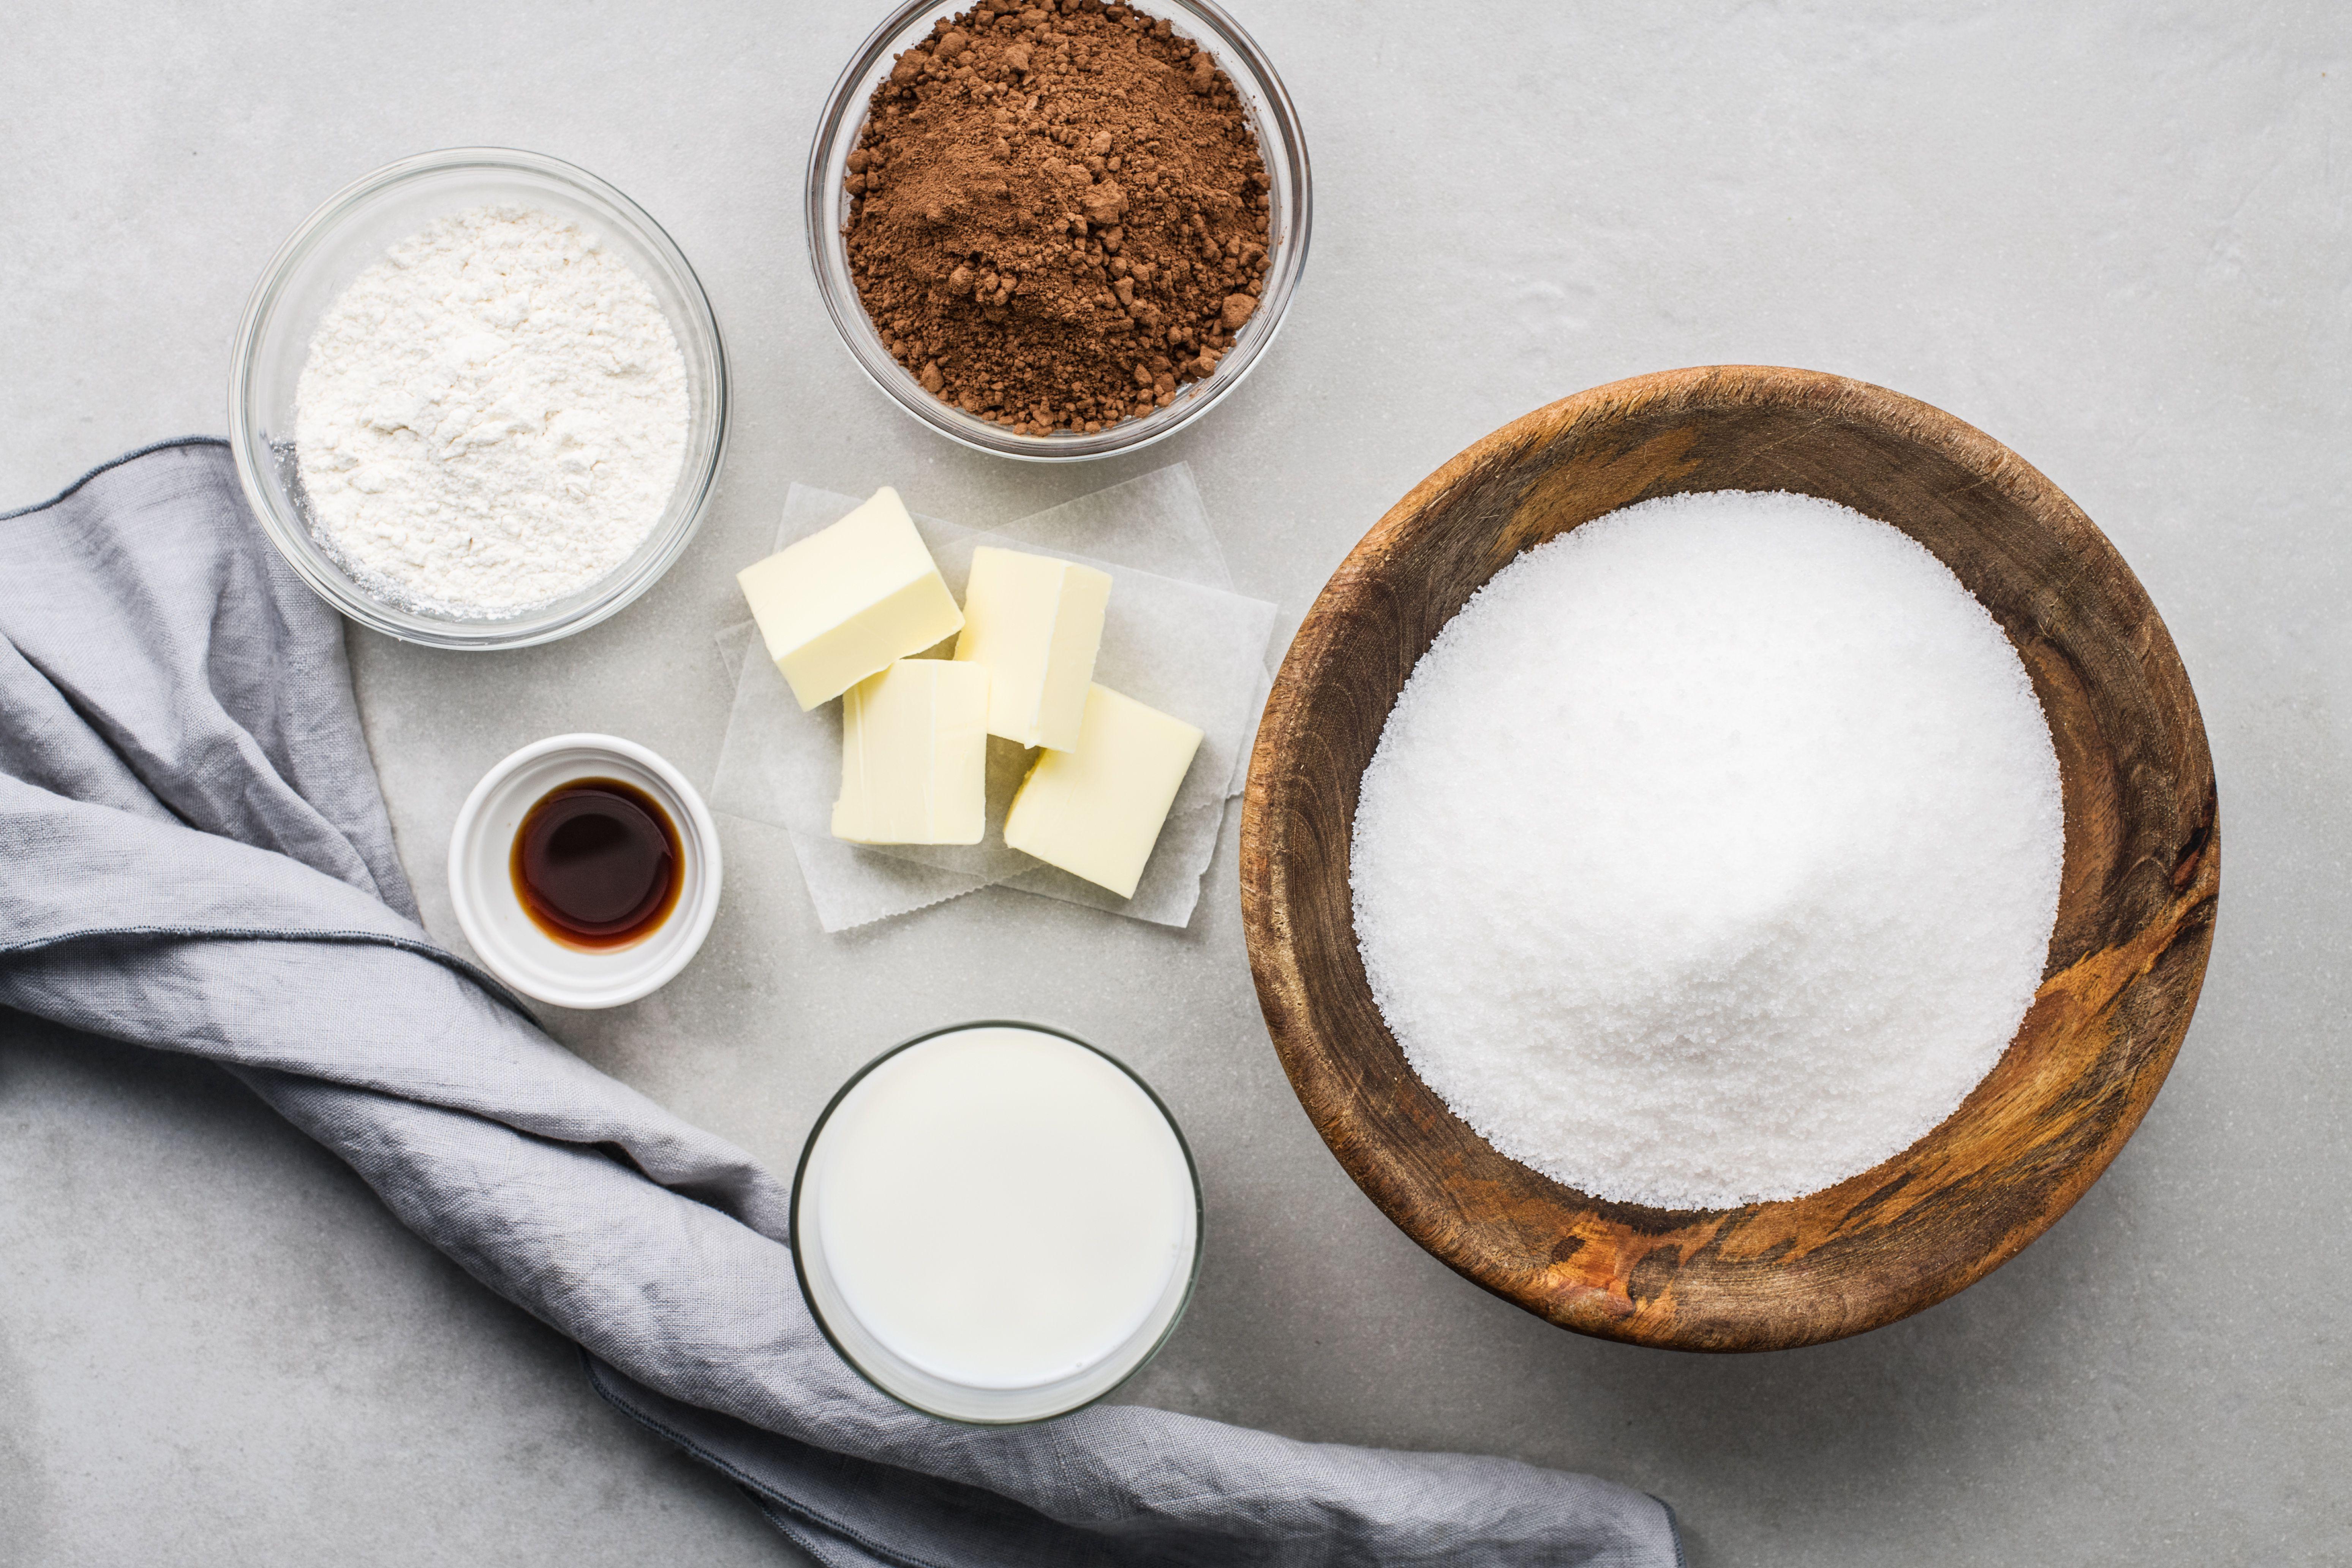 Hot fudge sauce recipe ingredients